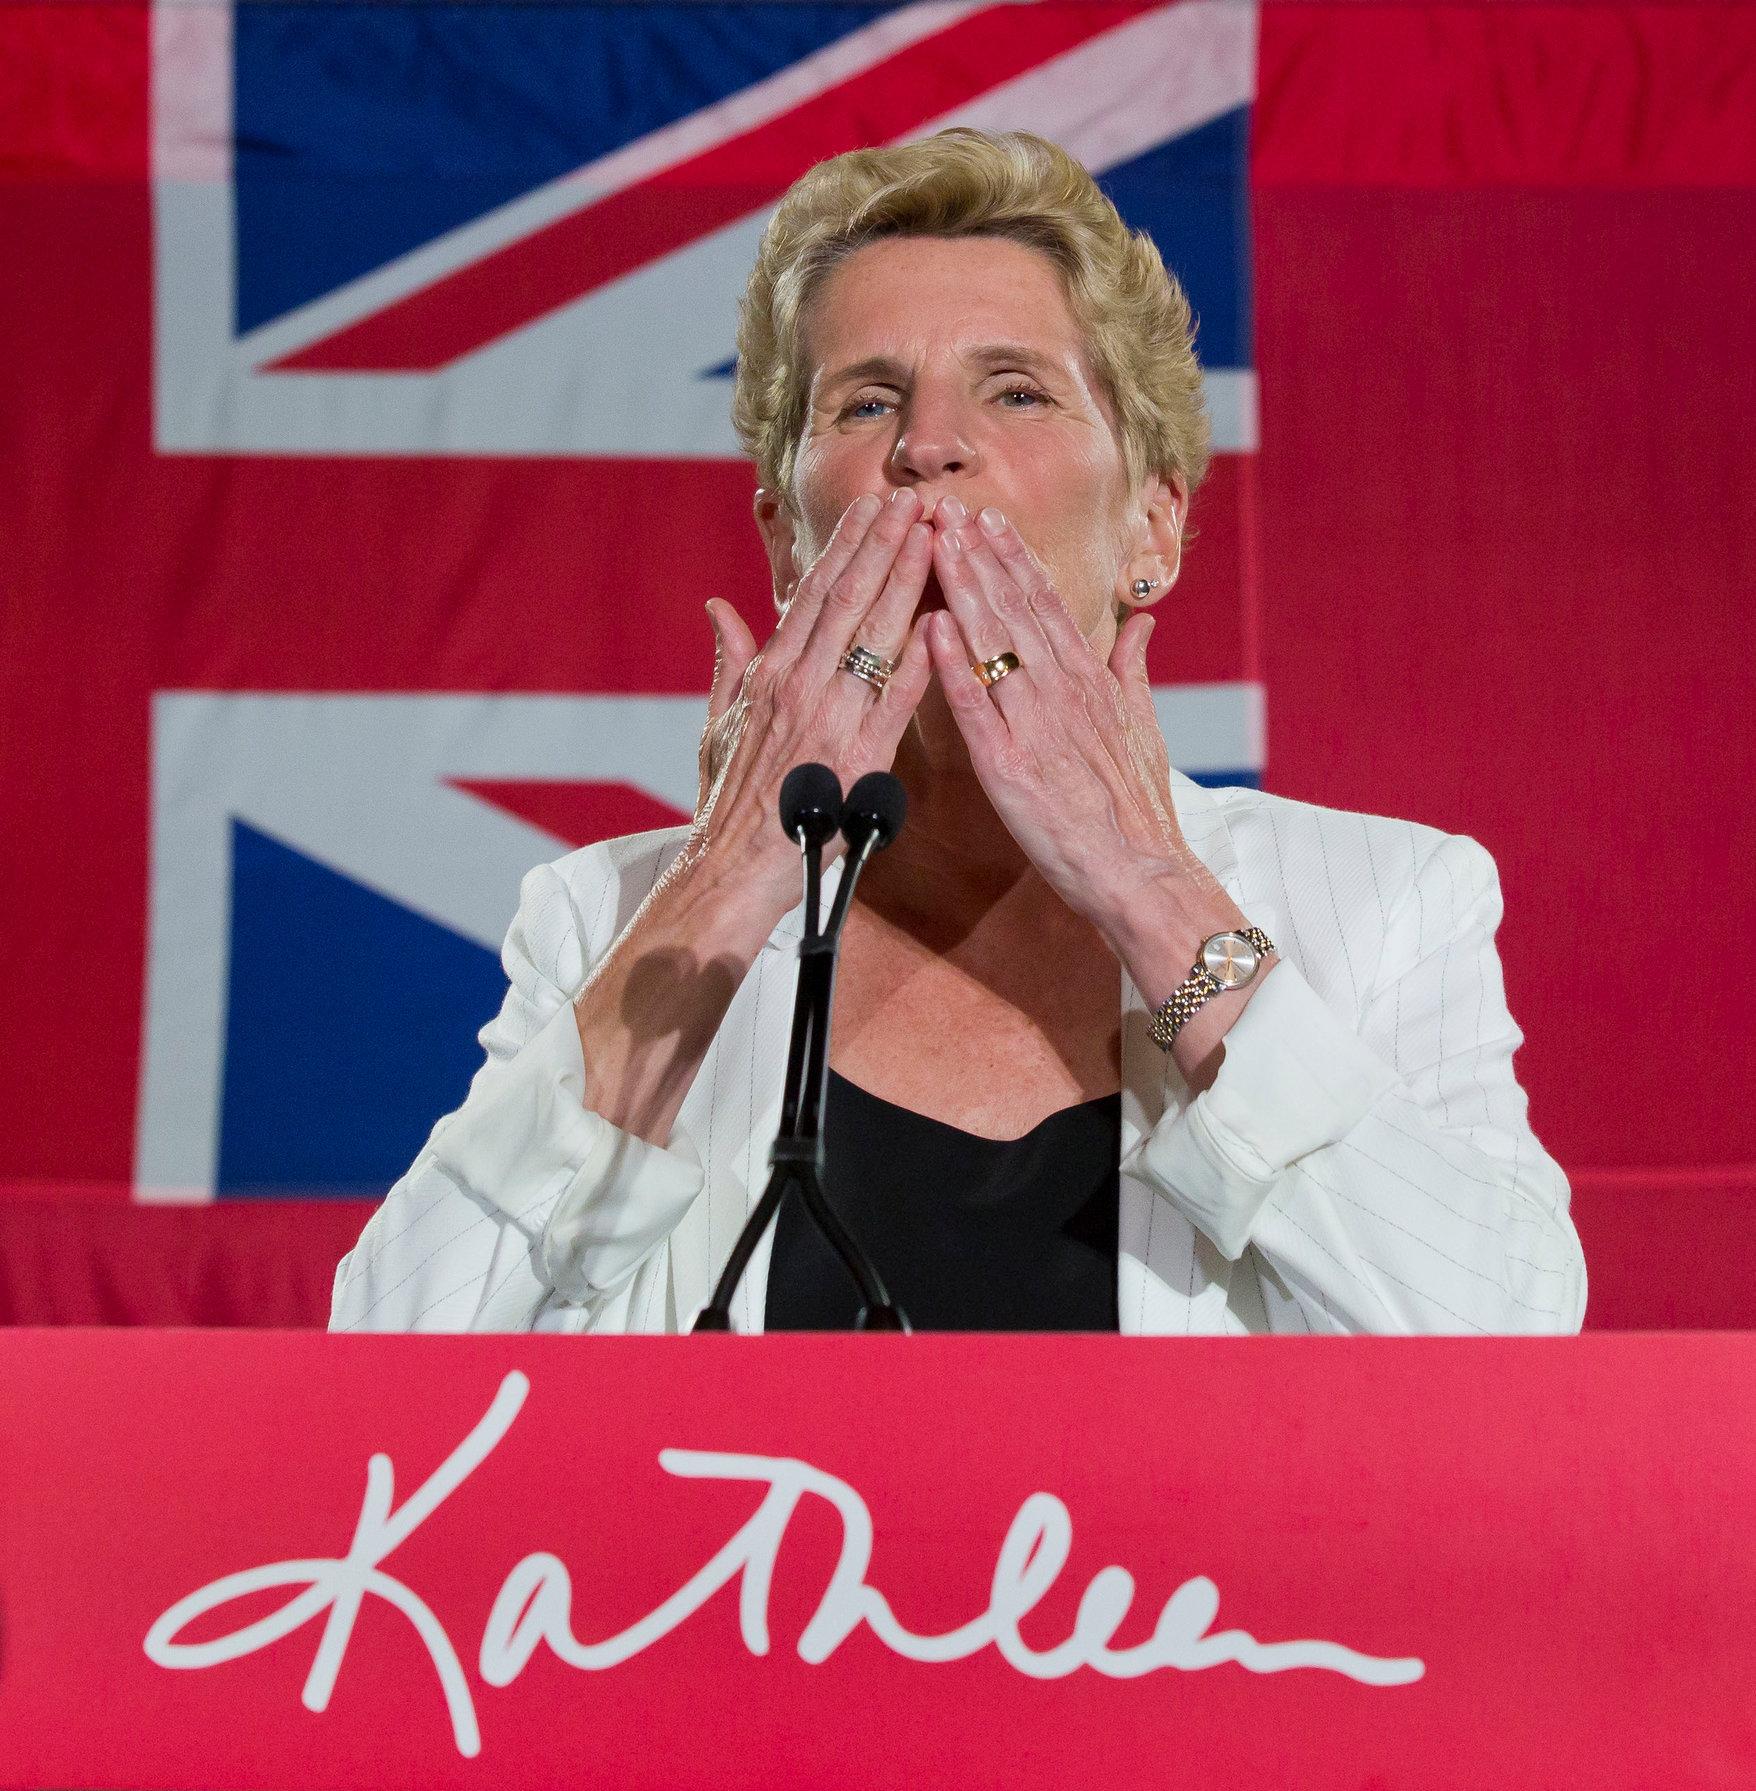 128_Kathleen_Wynne_Election.JPG